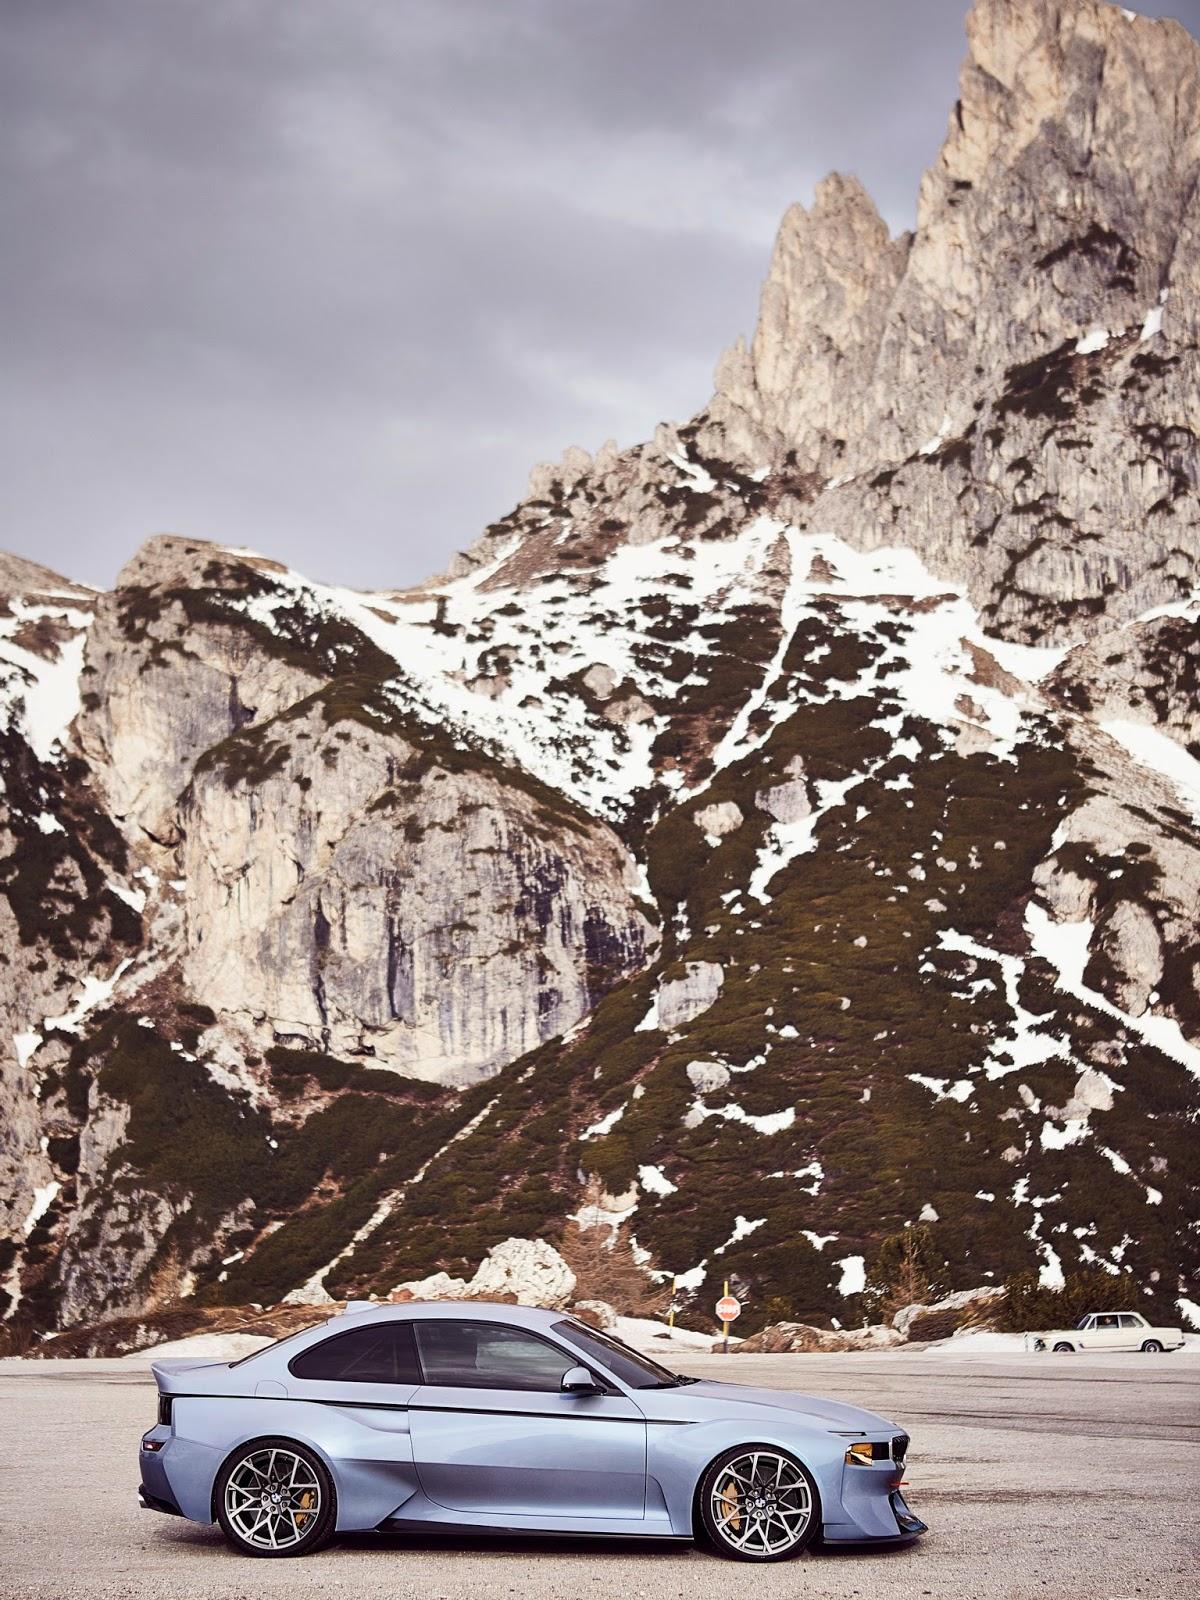 P90219725 highRes bmw 2002 hommage 05 1 1 H BMW γιορτάζει τα 50 χρόνια της θρυλικής 2002 turbo και παρουσιάζει την Bmw 2002 Hommage BMW, BMW 2002, BMW 2002 turbo, BMW Concept, BMW Hommage, supercars, videos